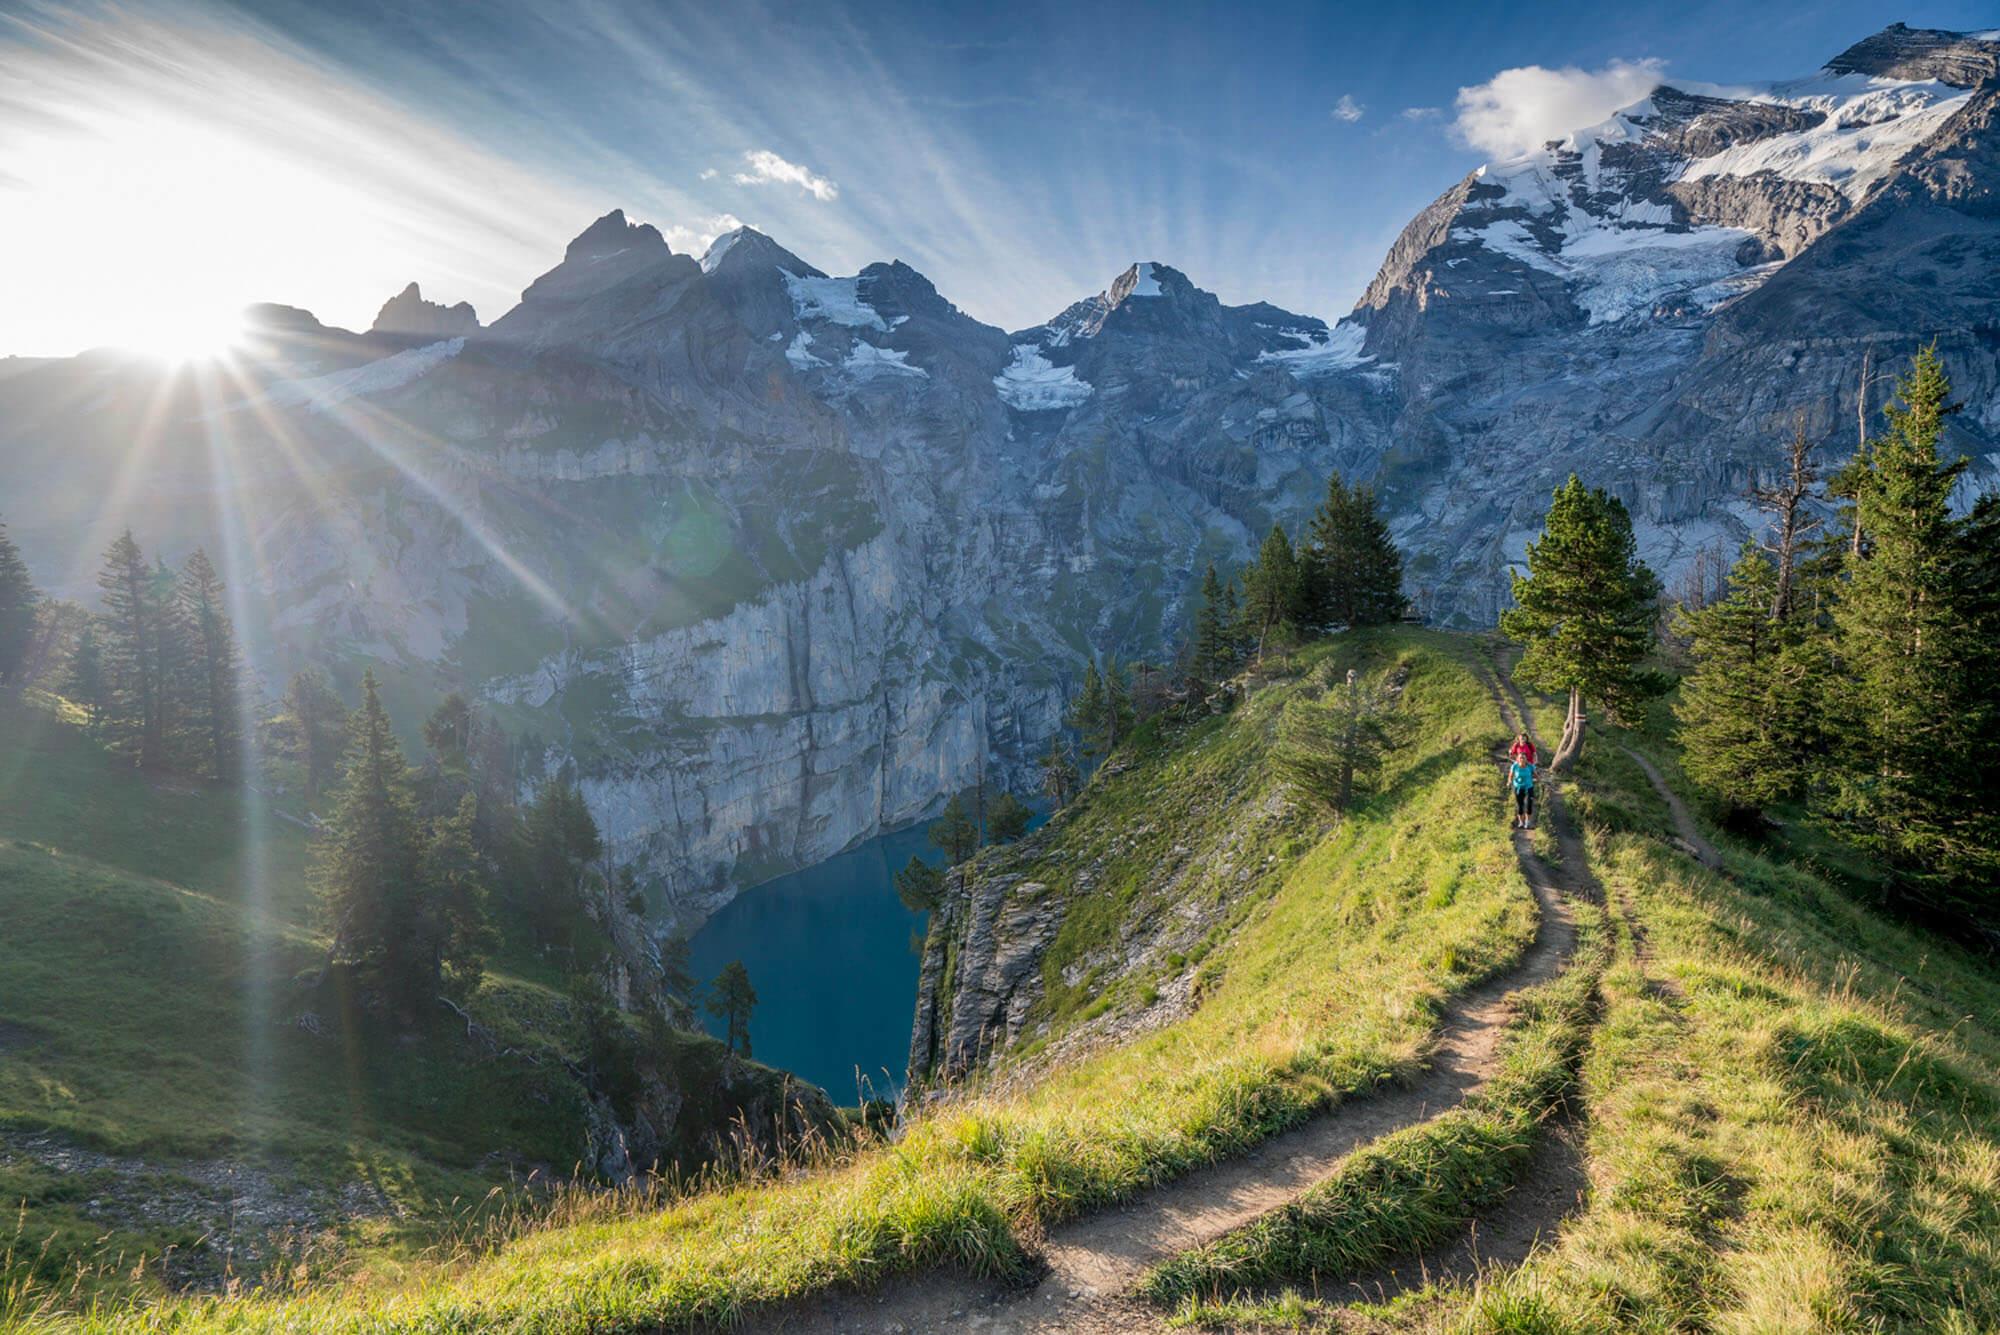 Fernwanderung Bärentrek im Berner Oberland